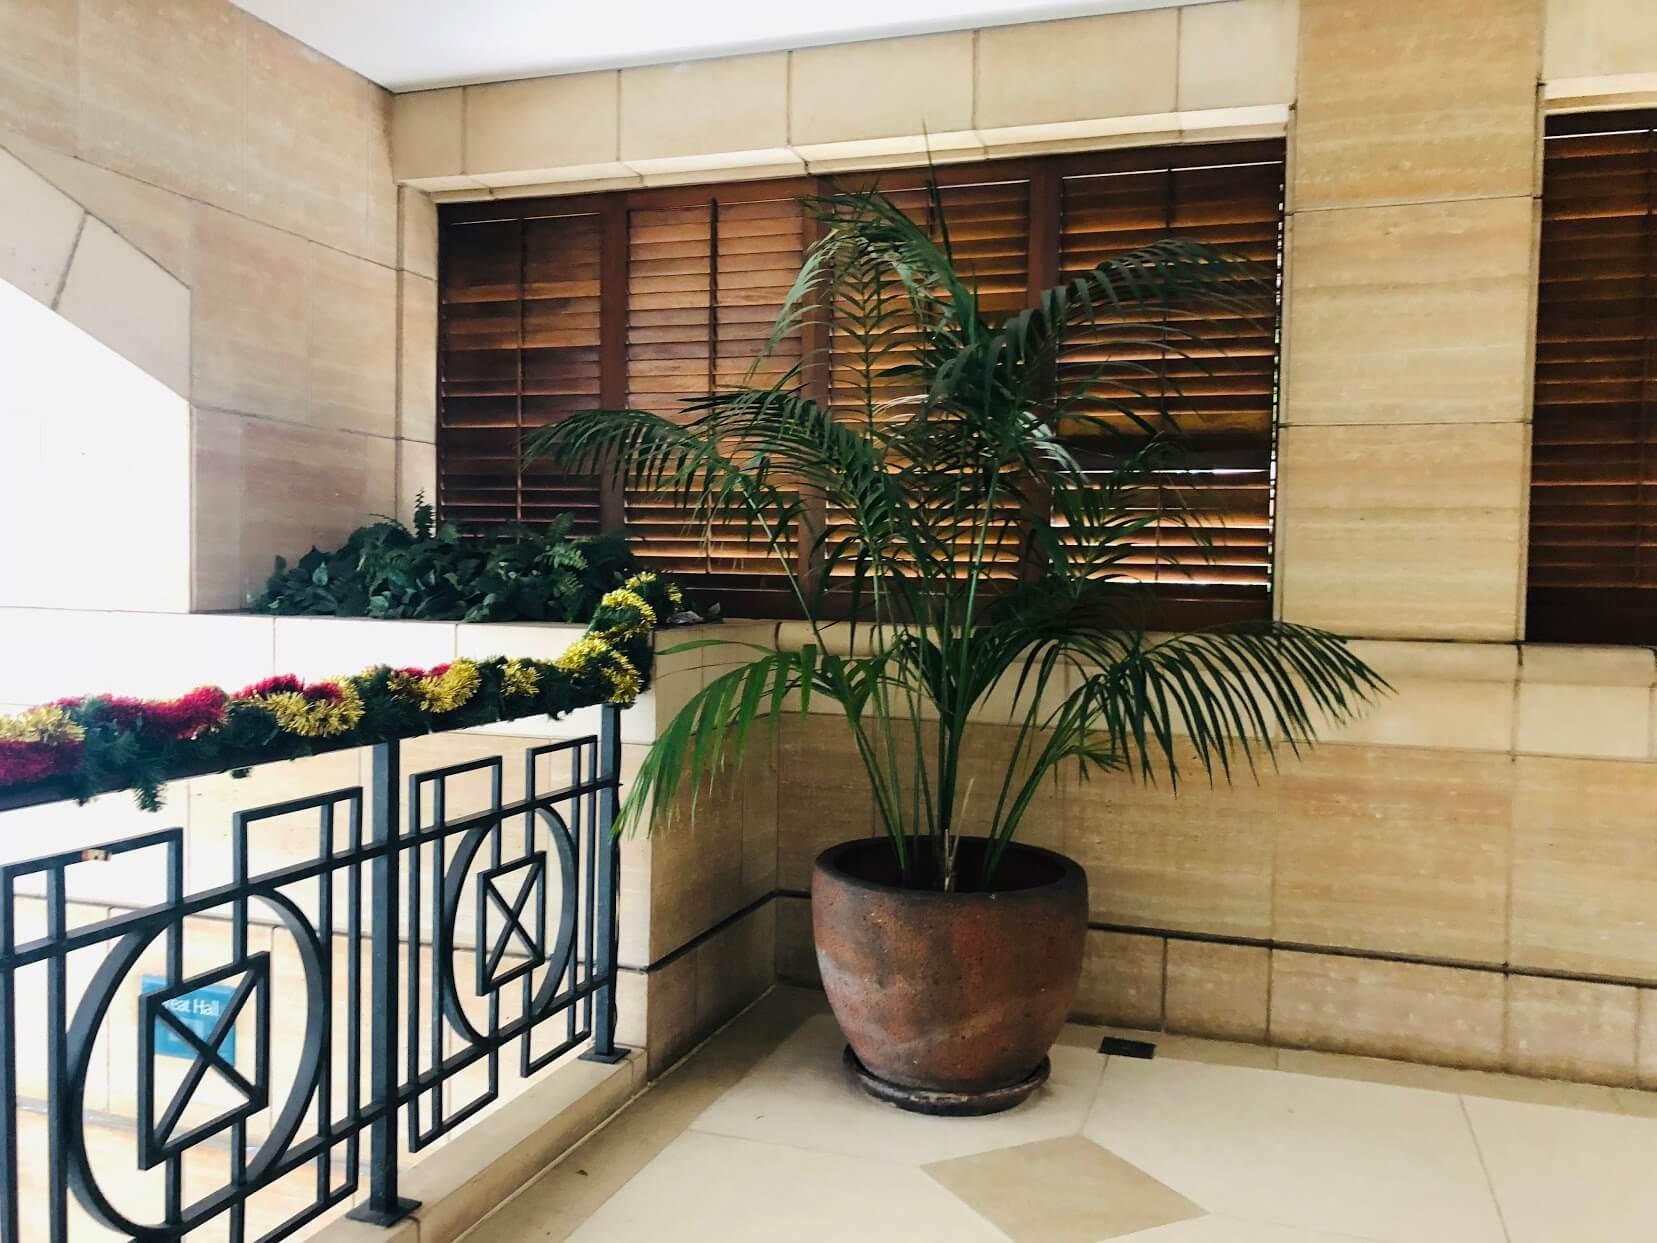 Courtyards at Punahouの植木鉢